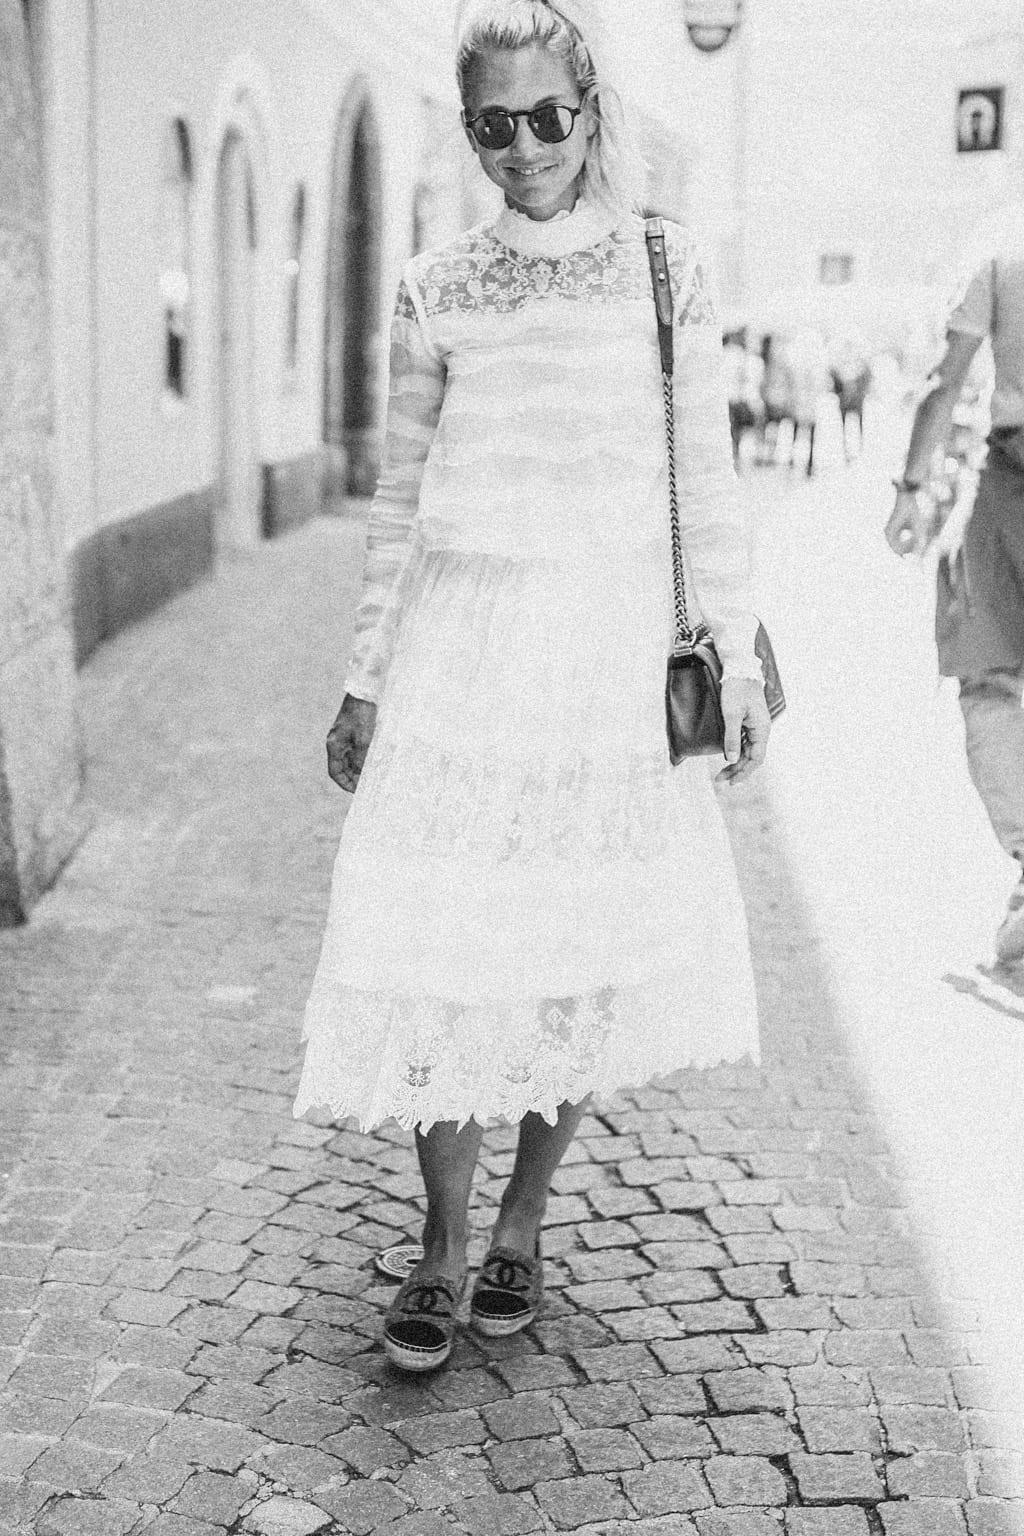 CK-1606-salzburg-austria-fashion-street-style-summer-spring-blog-karin-kaswurm-hm-kleid-2801